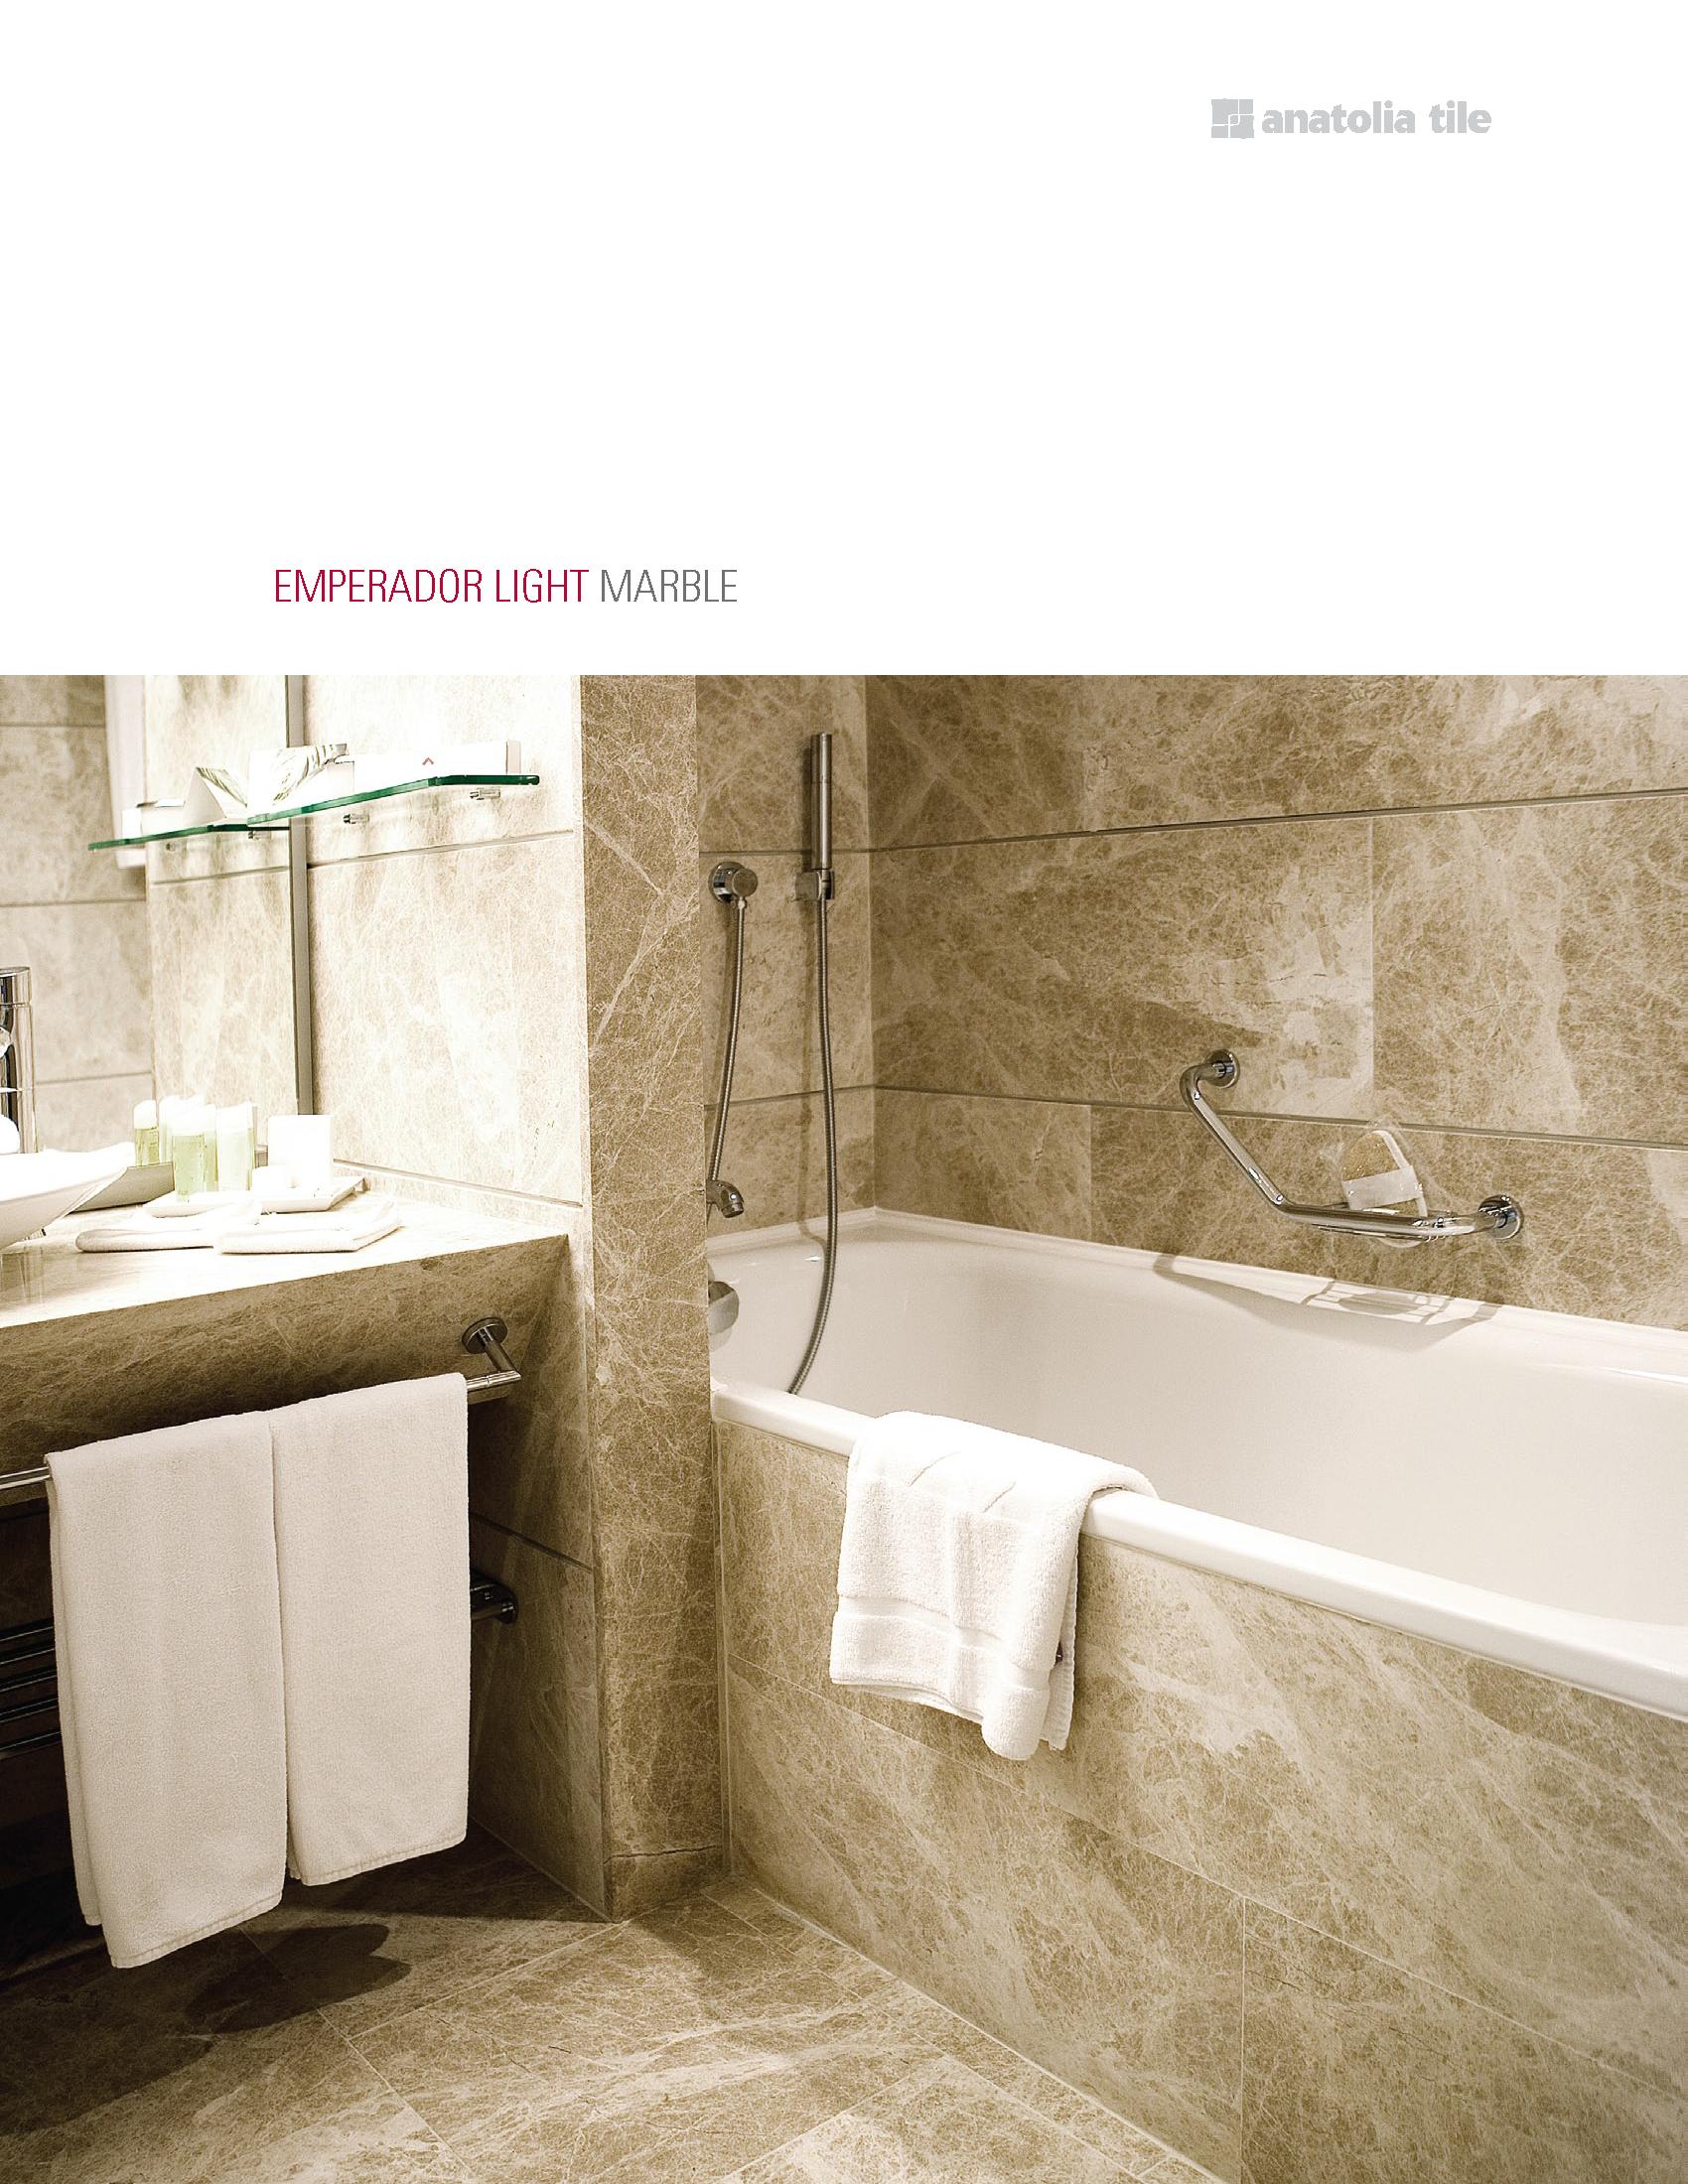 emperador light marble | anatolia tile natural stone | pinterest